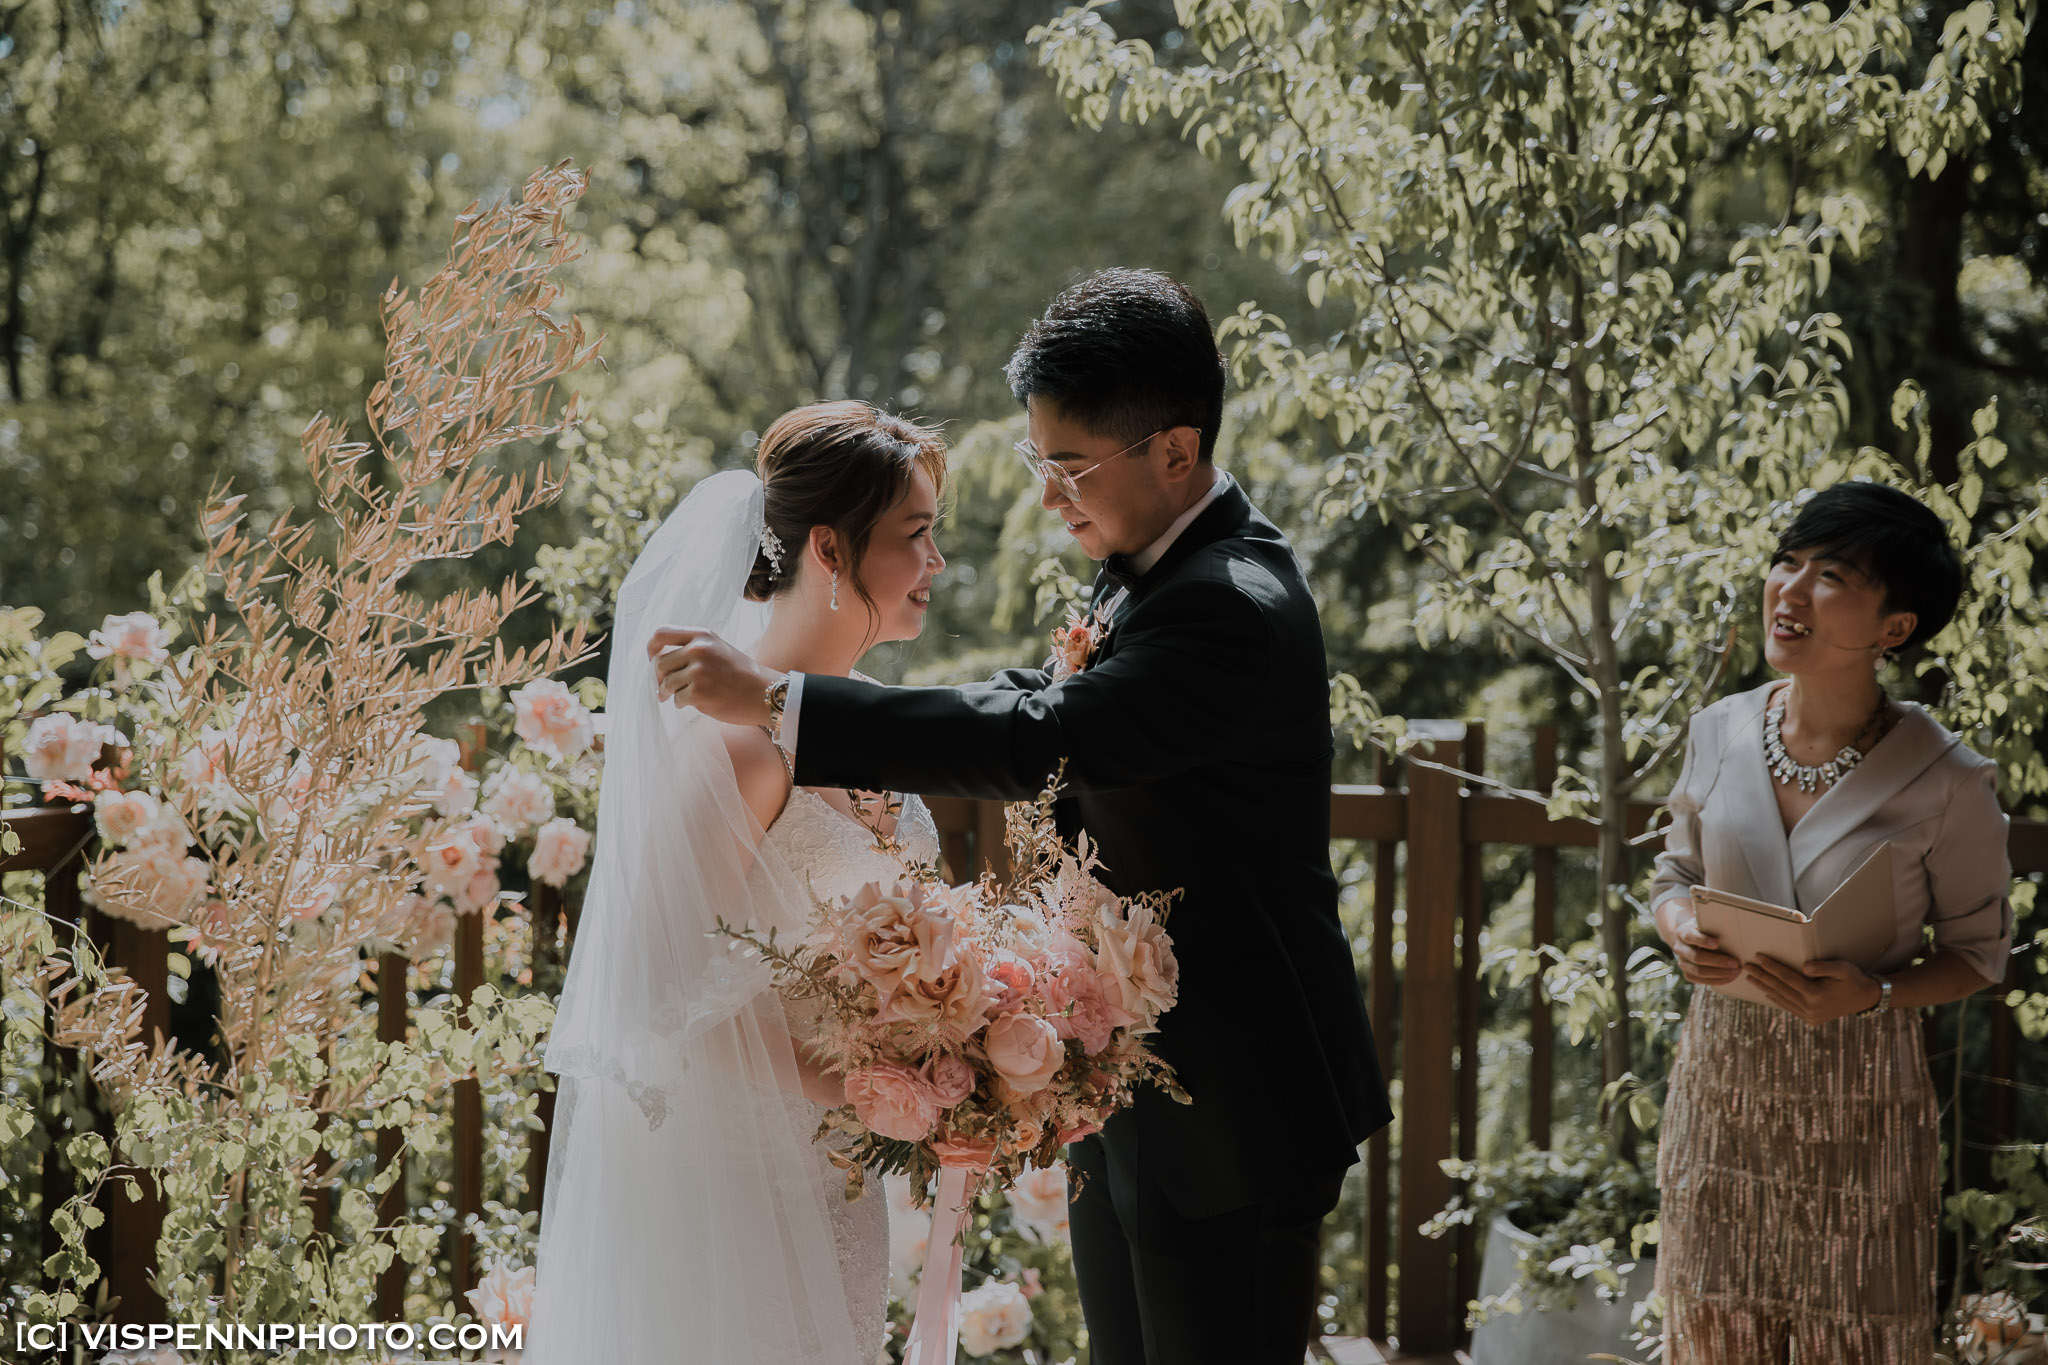 WEDDING DAY Photography Melbourne VISPENN 墨尔本 婚礼跟拍 婚礼摄像 婚礼摄影 结婚照 登记照 ElitaPB 07483 2P 1DX2 VISPENN